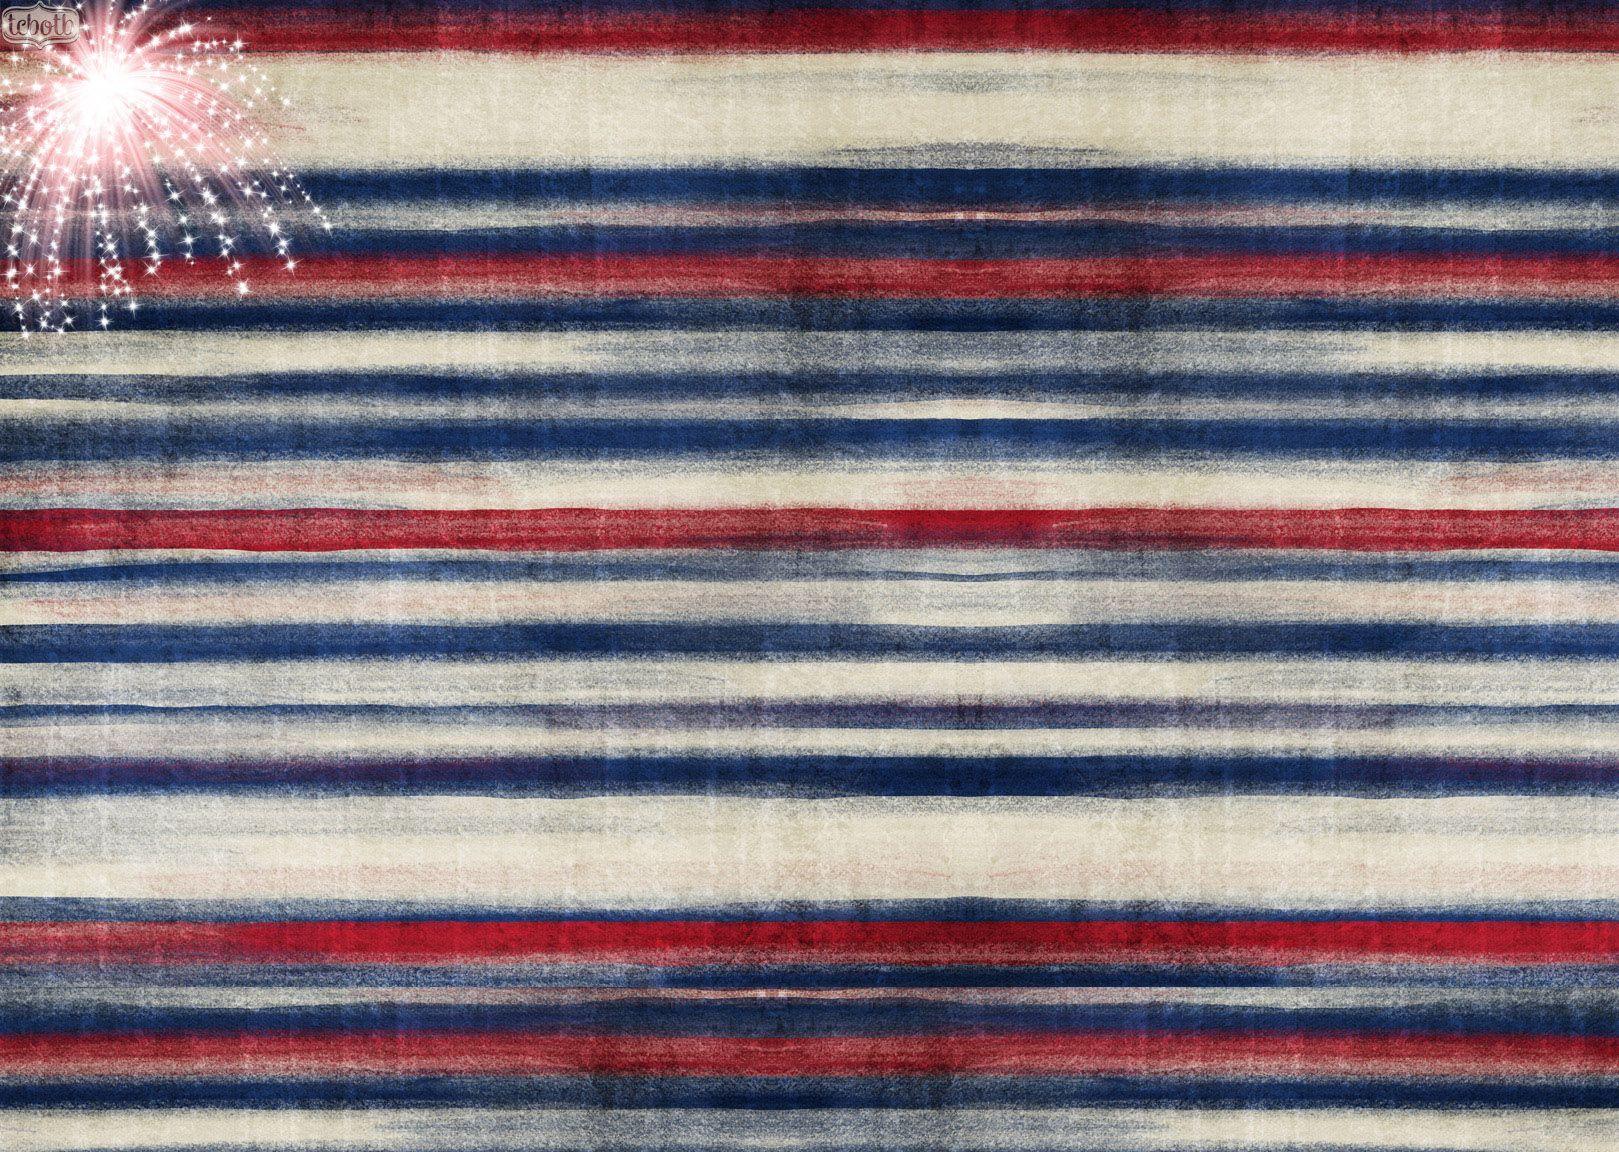 Patriotic backgrounds patrioticvibez pinterest patriotic backgrounds voltagebd Choice Image